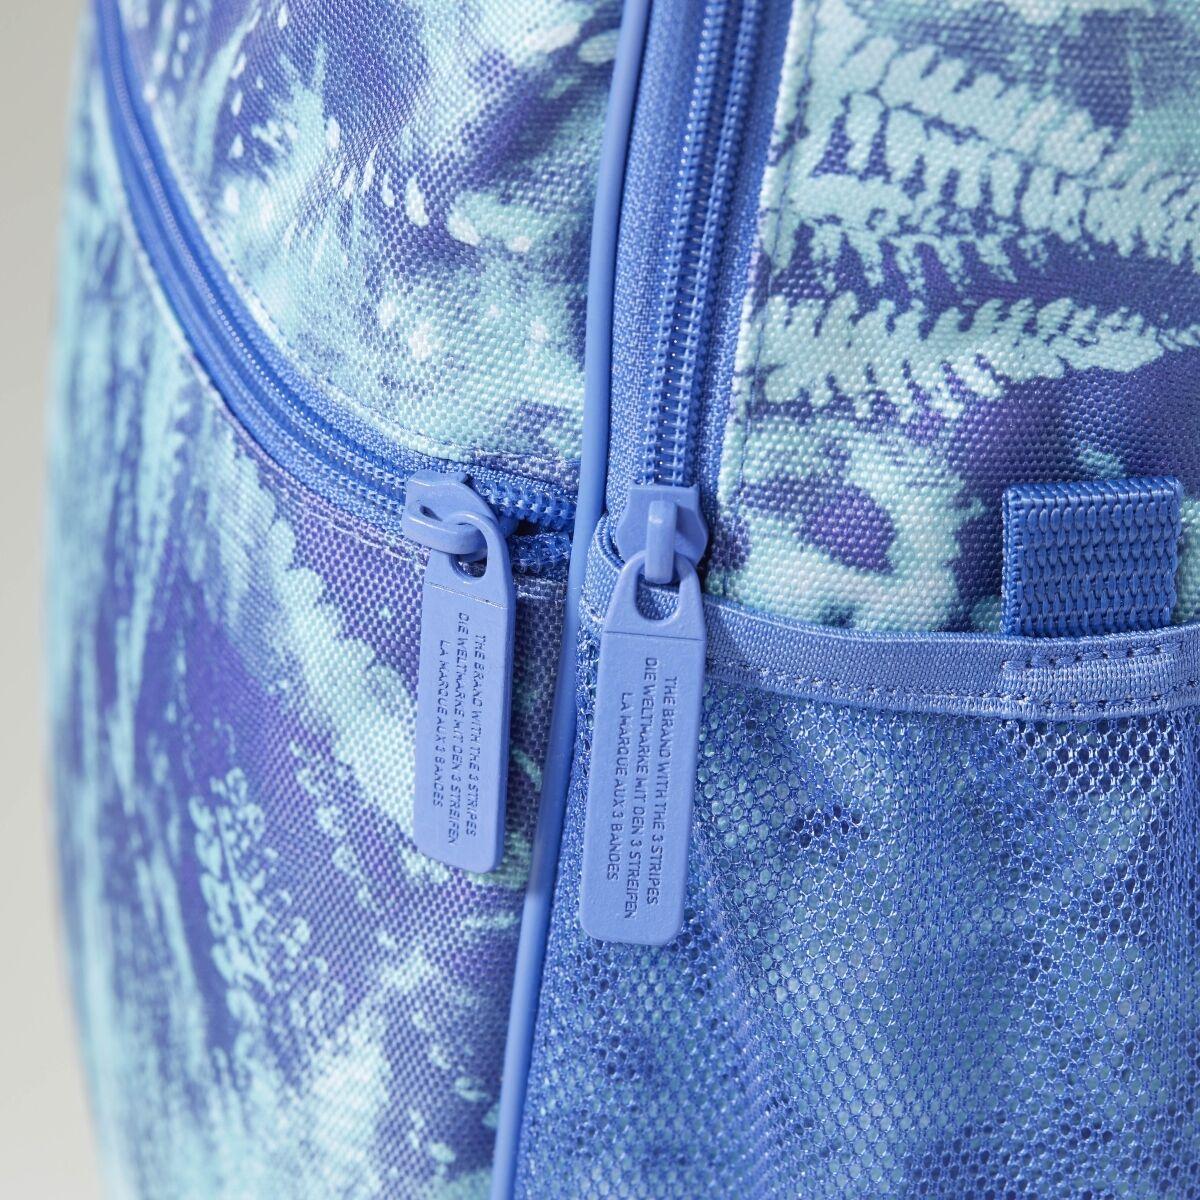 8622cc0c7394 adidas Originals Ocean Elements Women s Backpack Cf5490 Aero Blue for sale  online